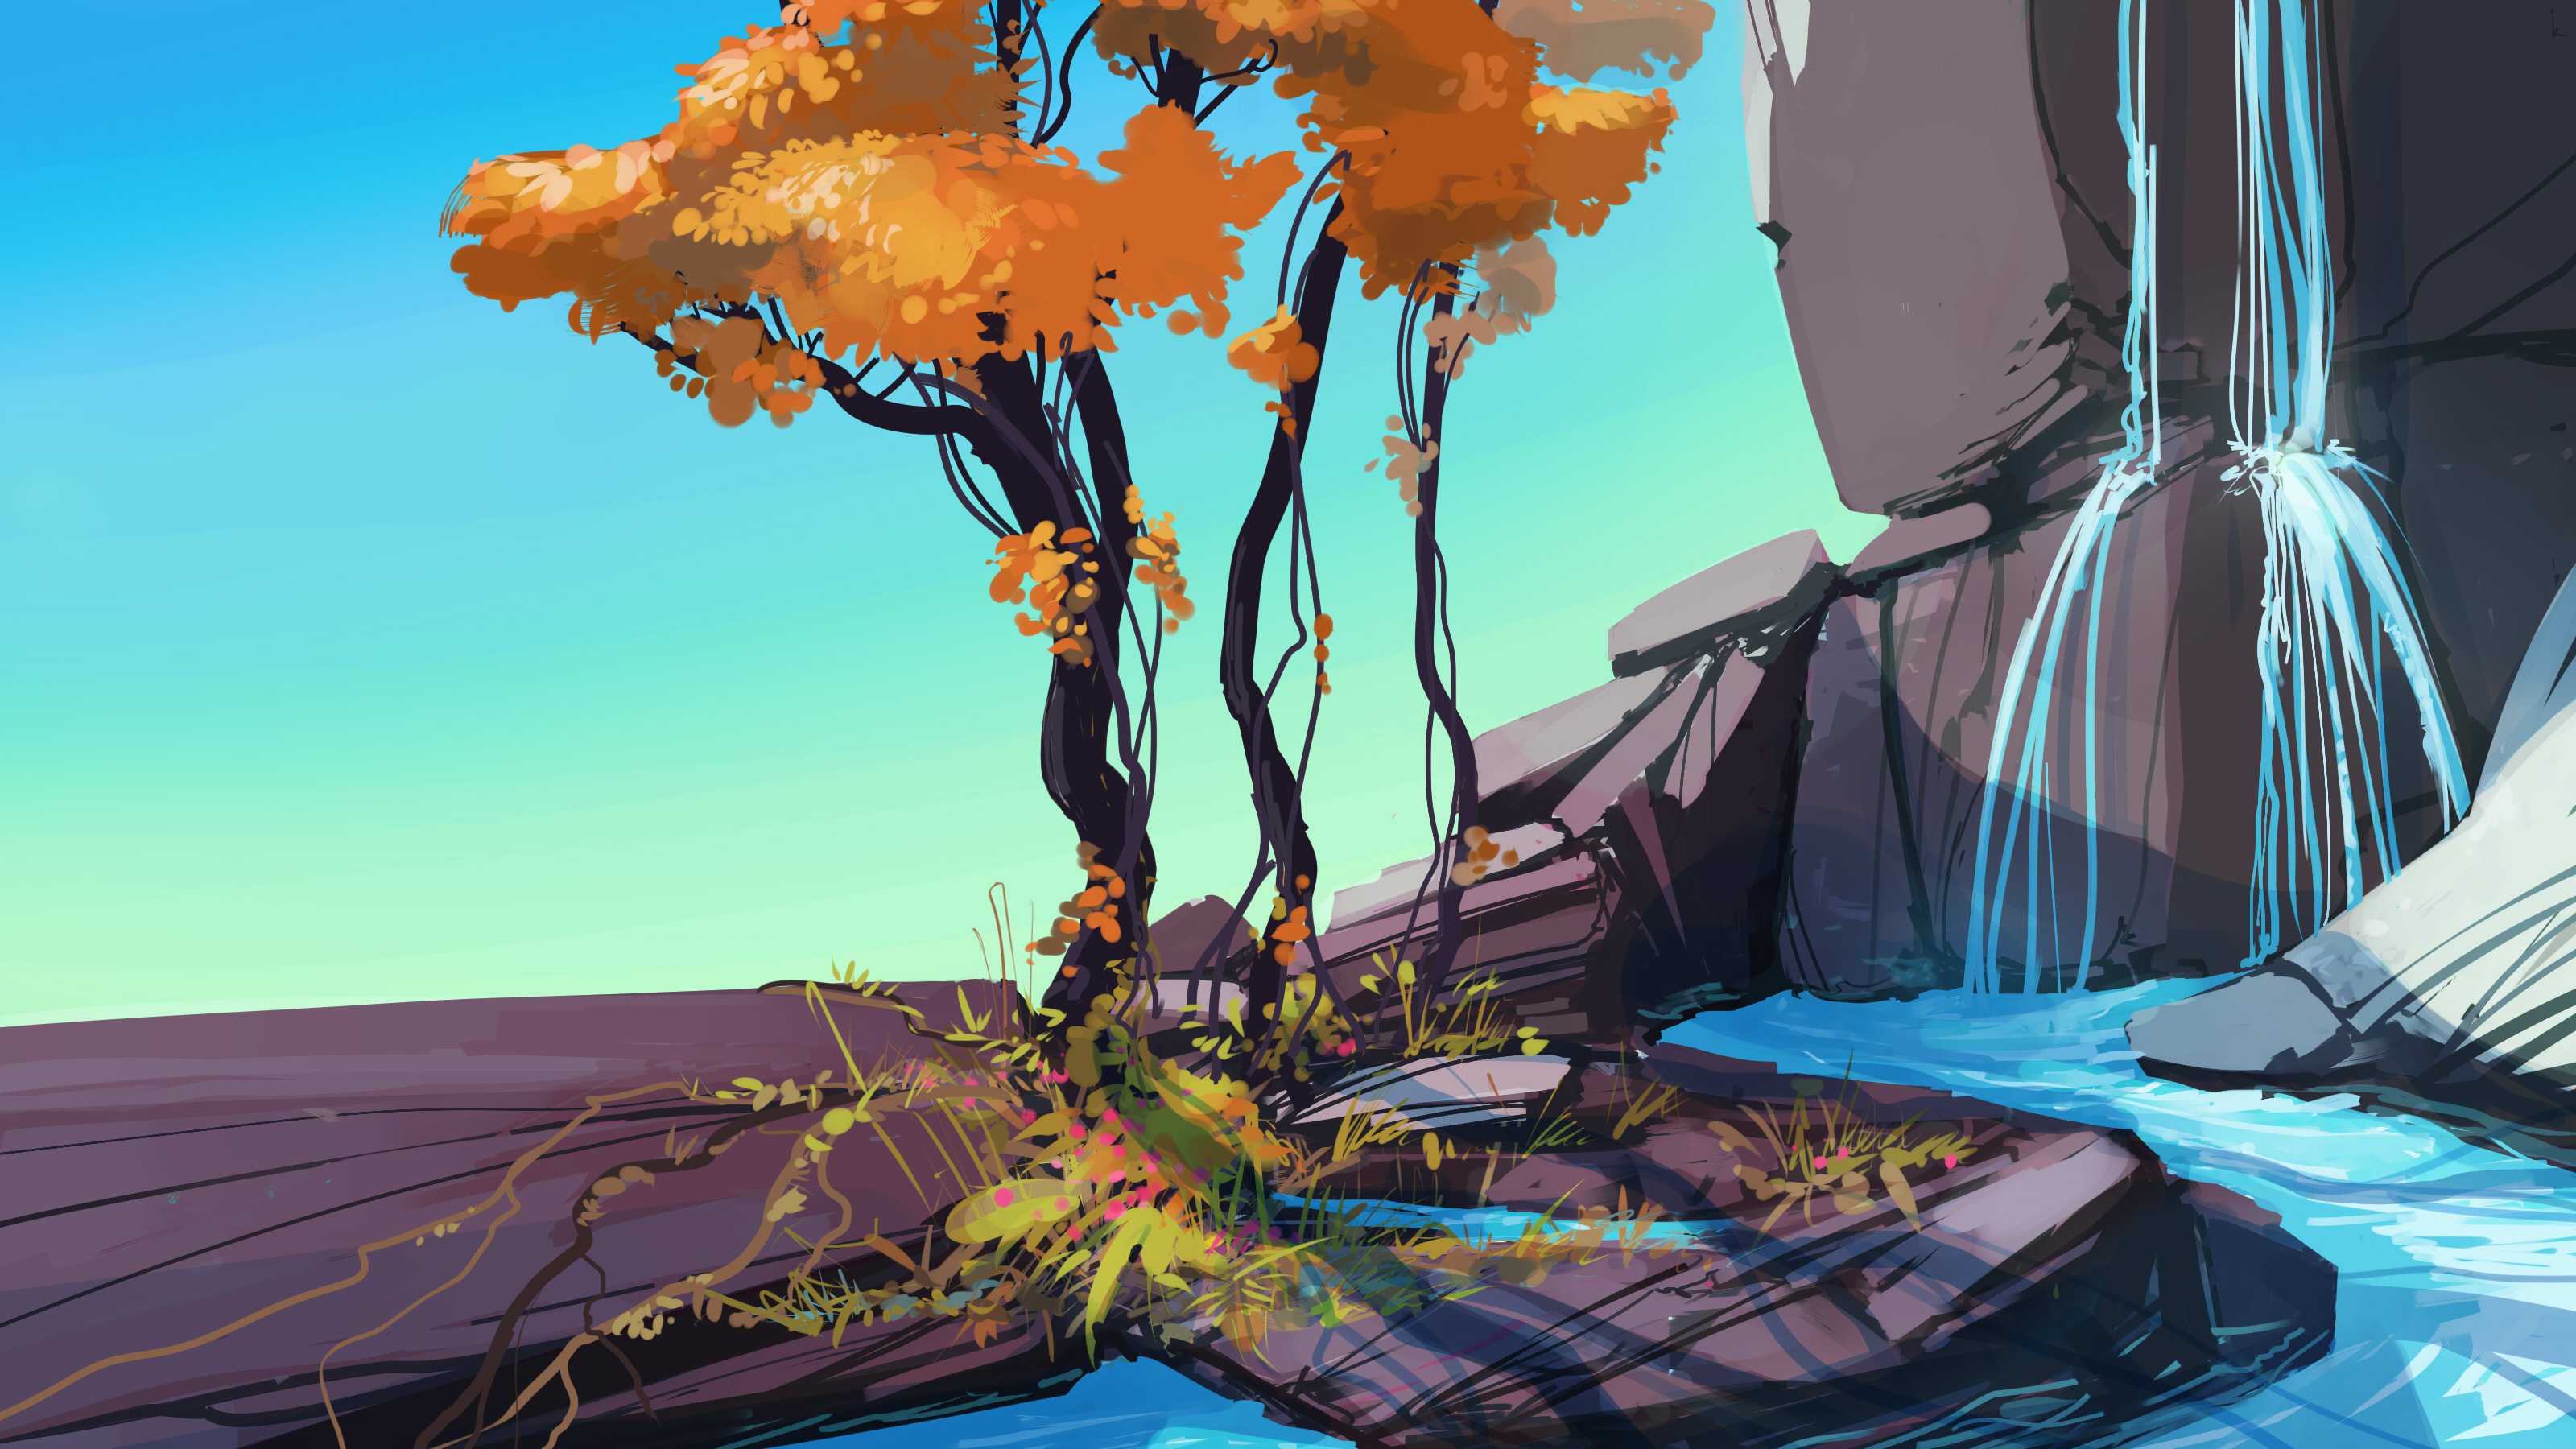 Landscape hd wallpaper background image 3200x1800 id - 3200x1800 wallpaper ...